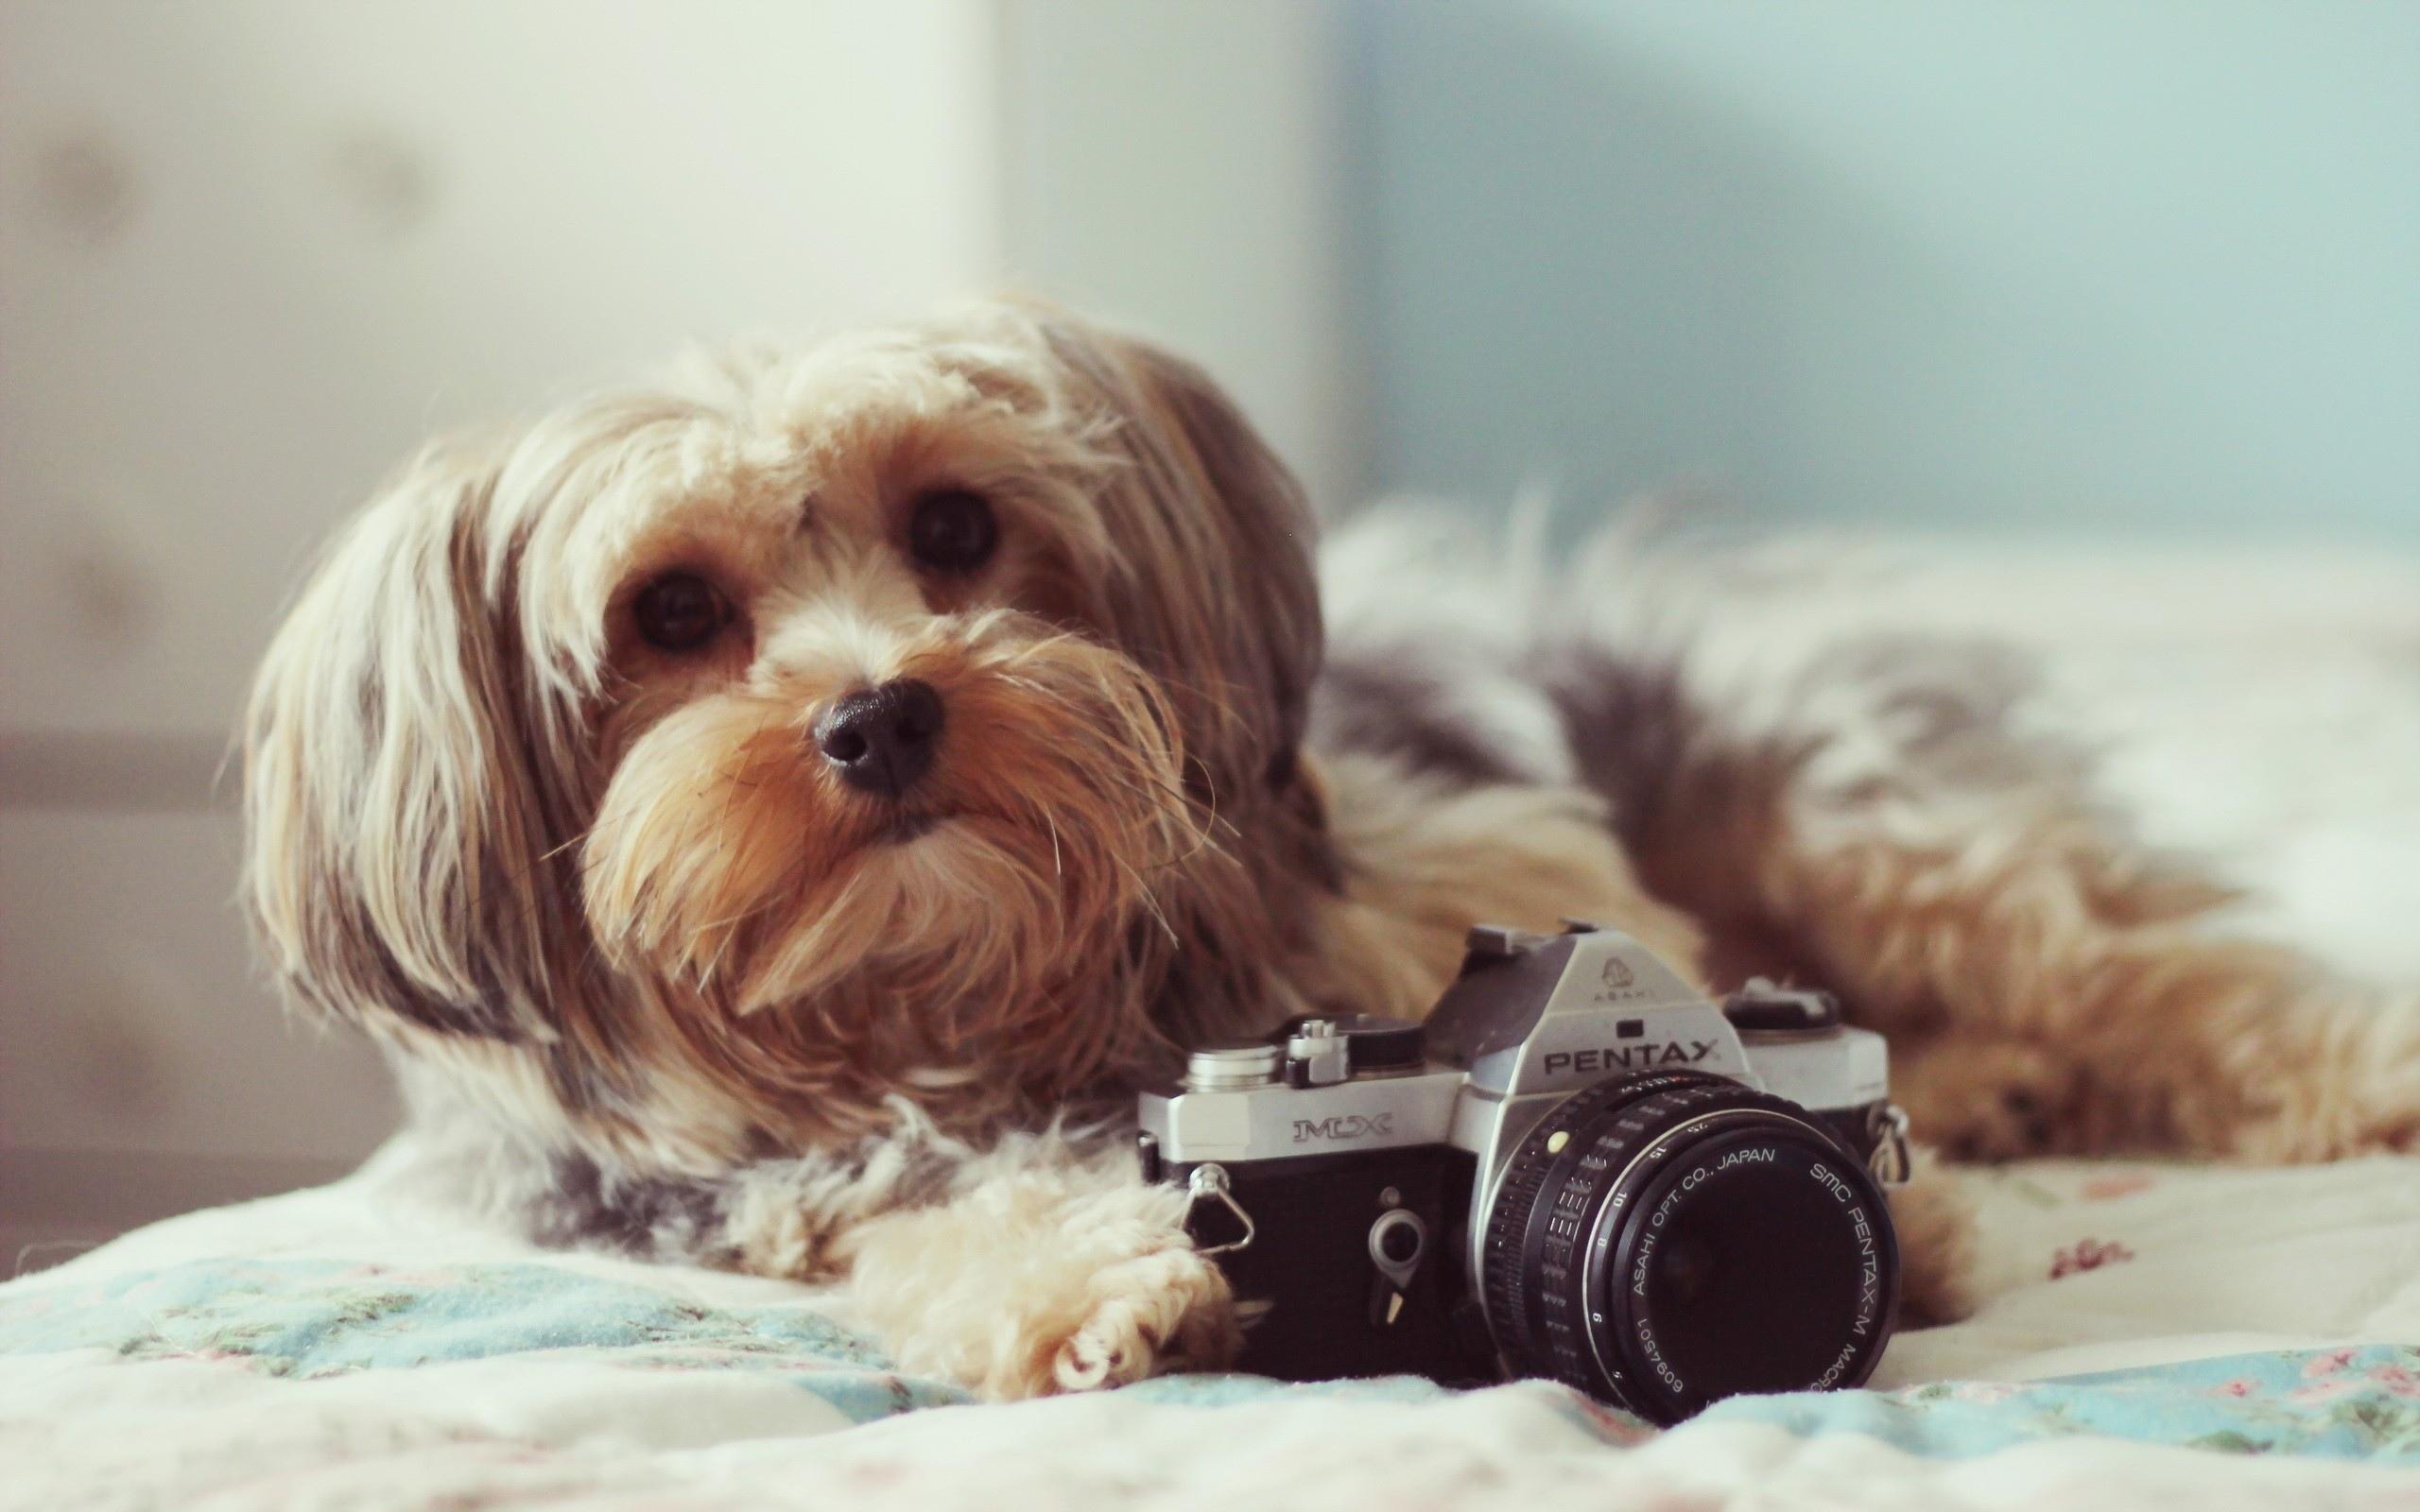 Wallpaper Face Bed Camera Lie Shih Tzu Puppy Fluffy